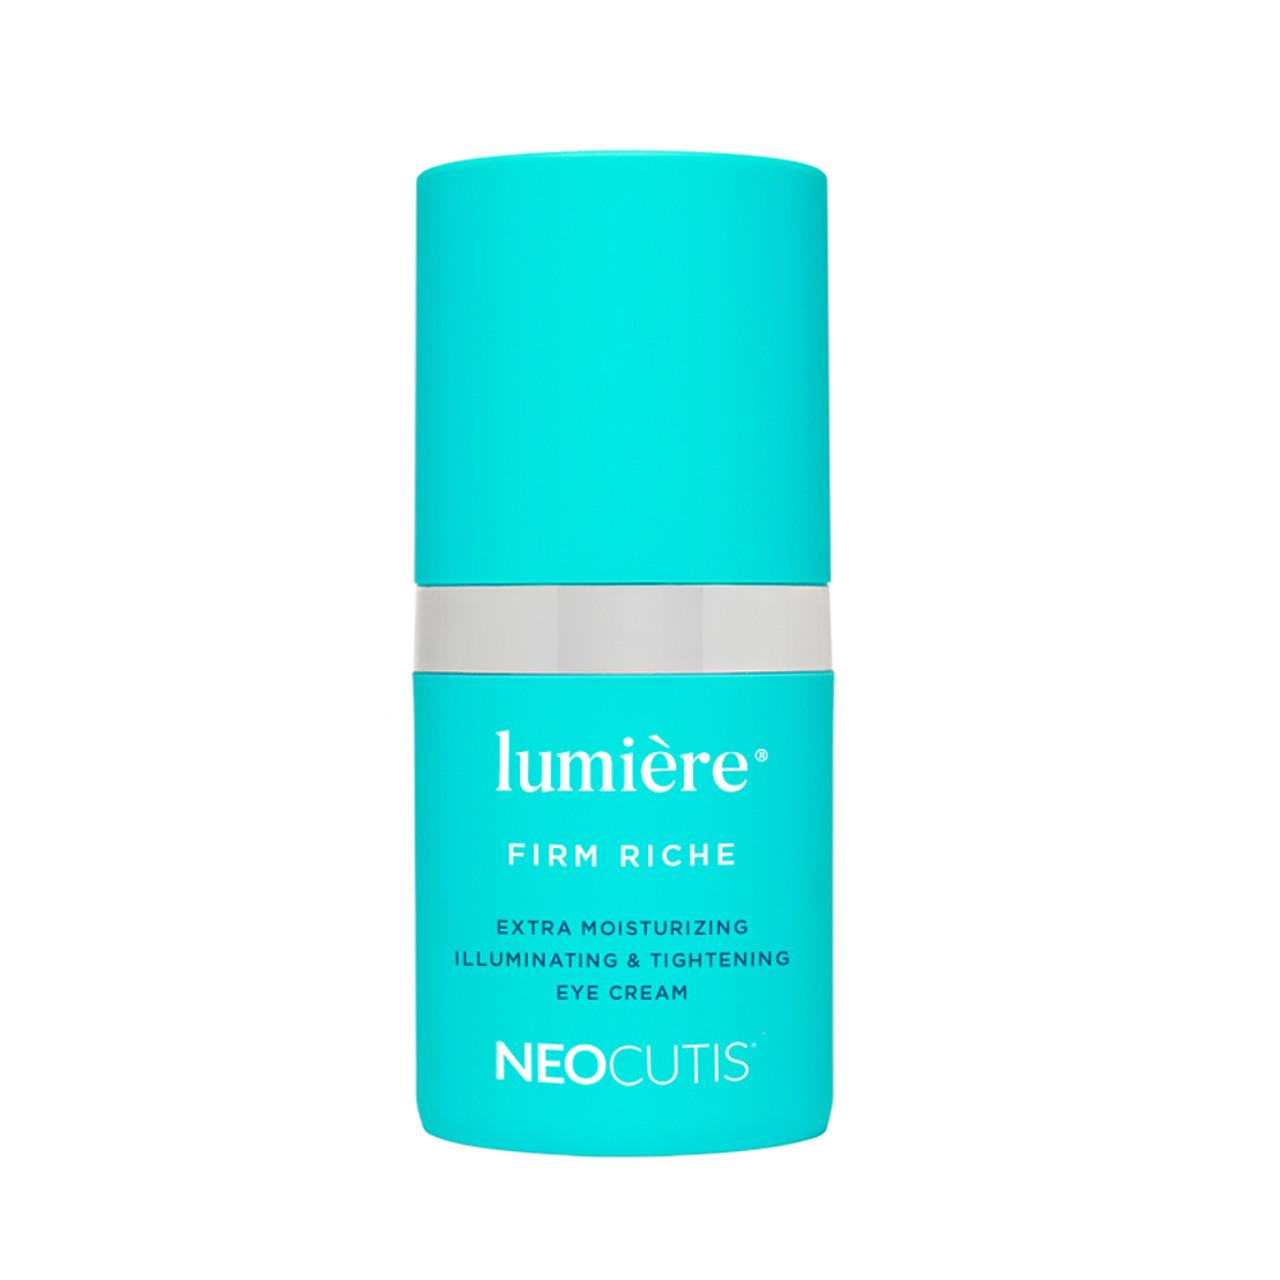 Neocutis Lumiere Firm Riche Extra Moisturizing Illuminating & Tightening Eye Cream BeautifiedYou.com